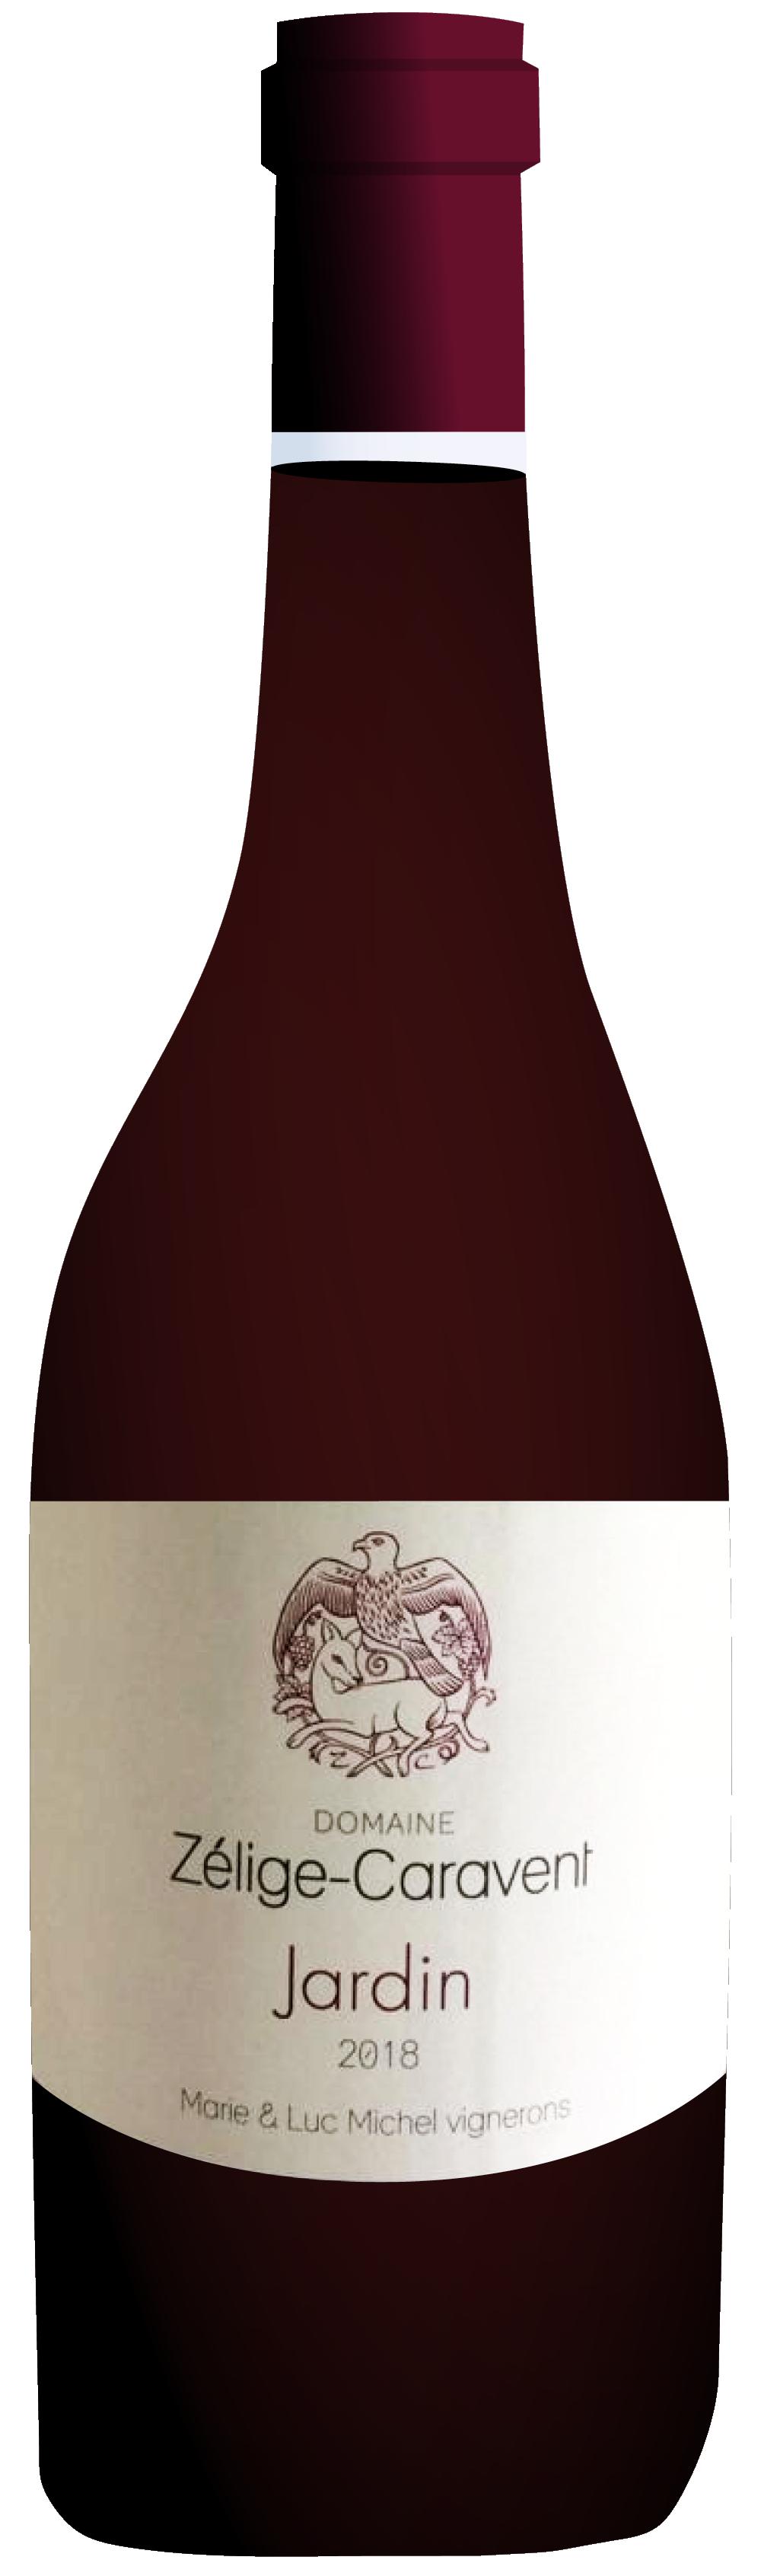 the natural wine company club october 2020 france zelige caravent jardin